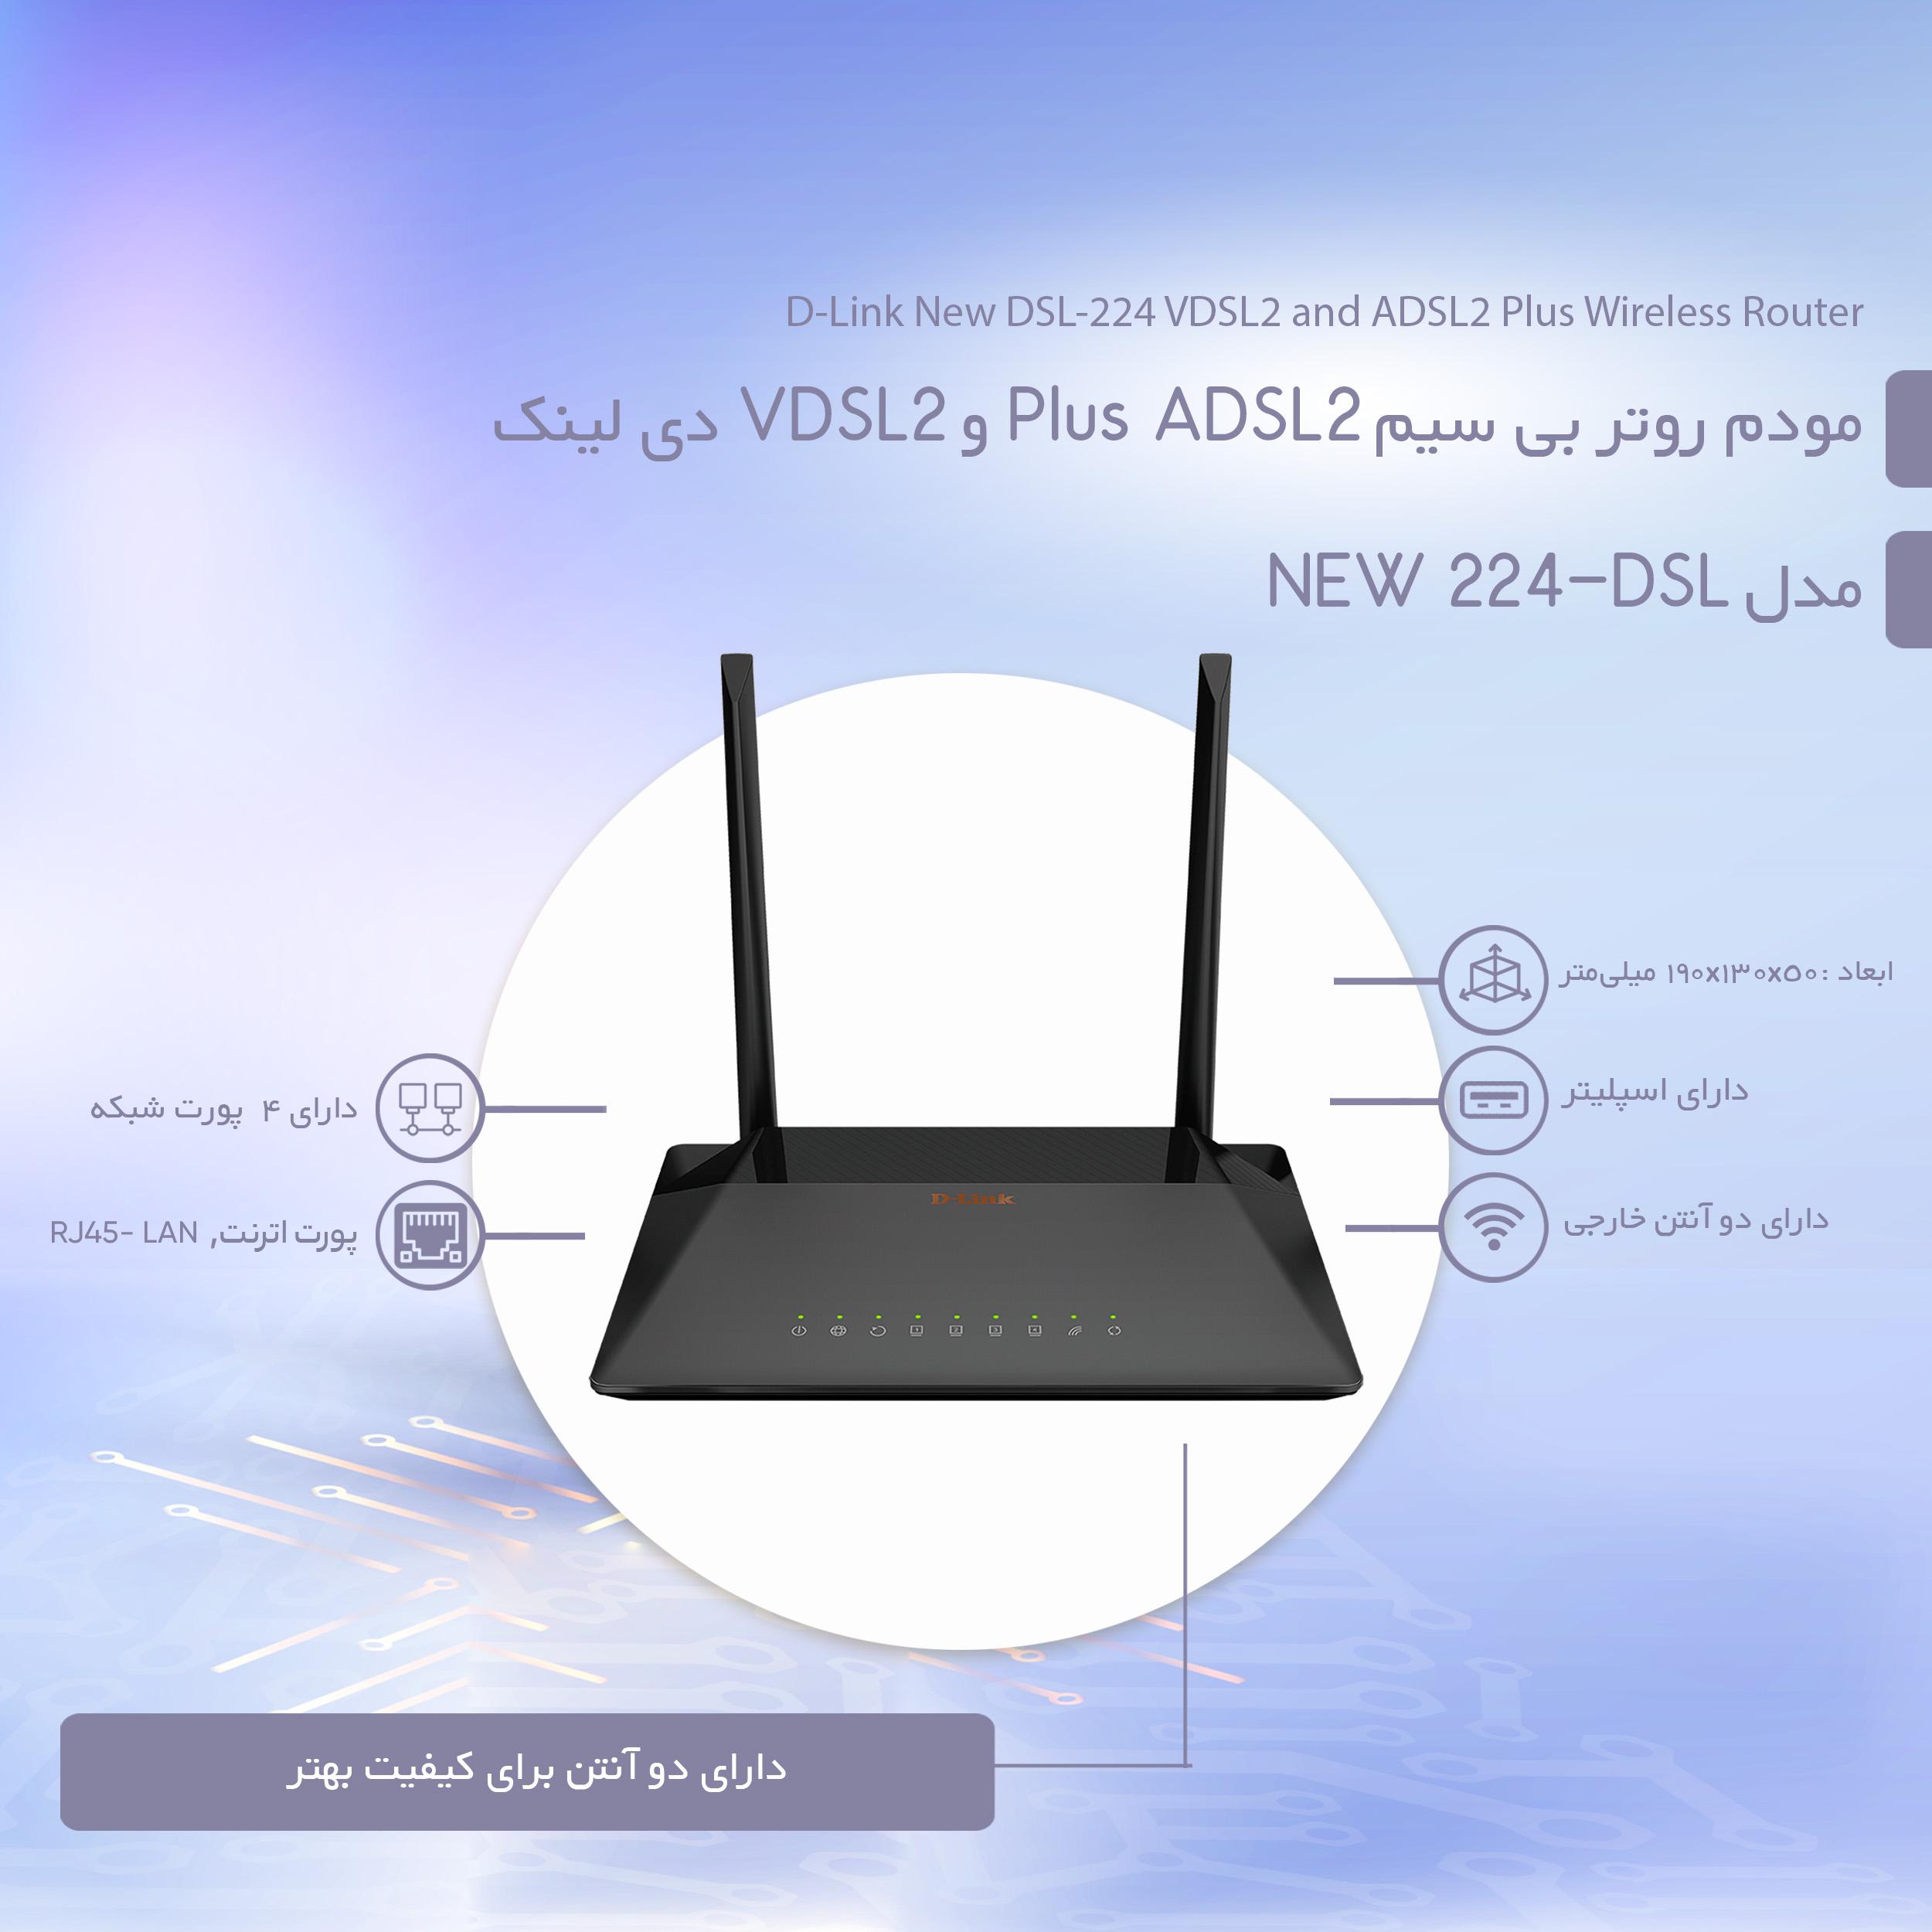 مودم روتر بی سیم ADSL2 Plus و VDSL2 دی لینک مدل DSL-224 NEW